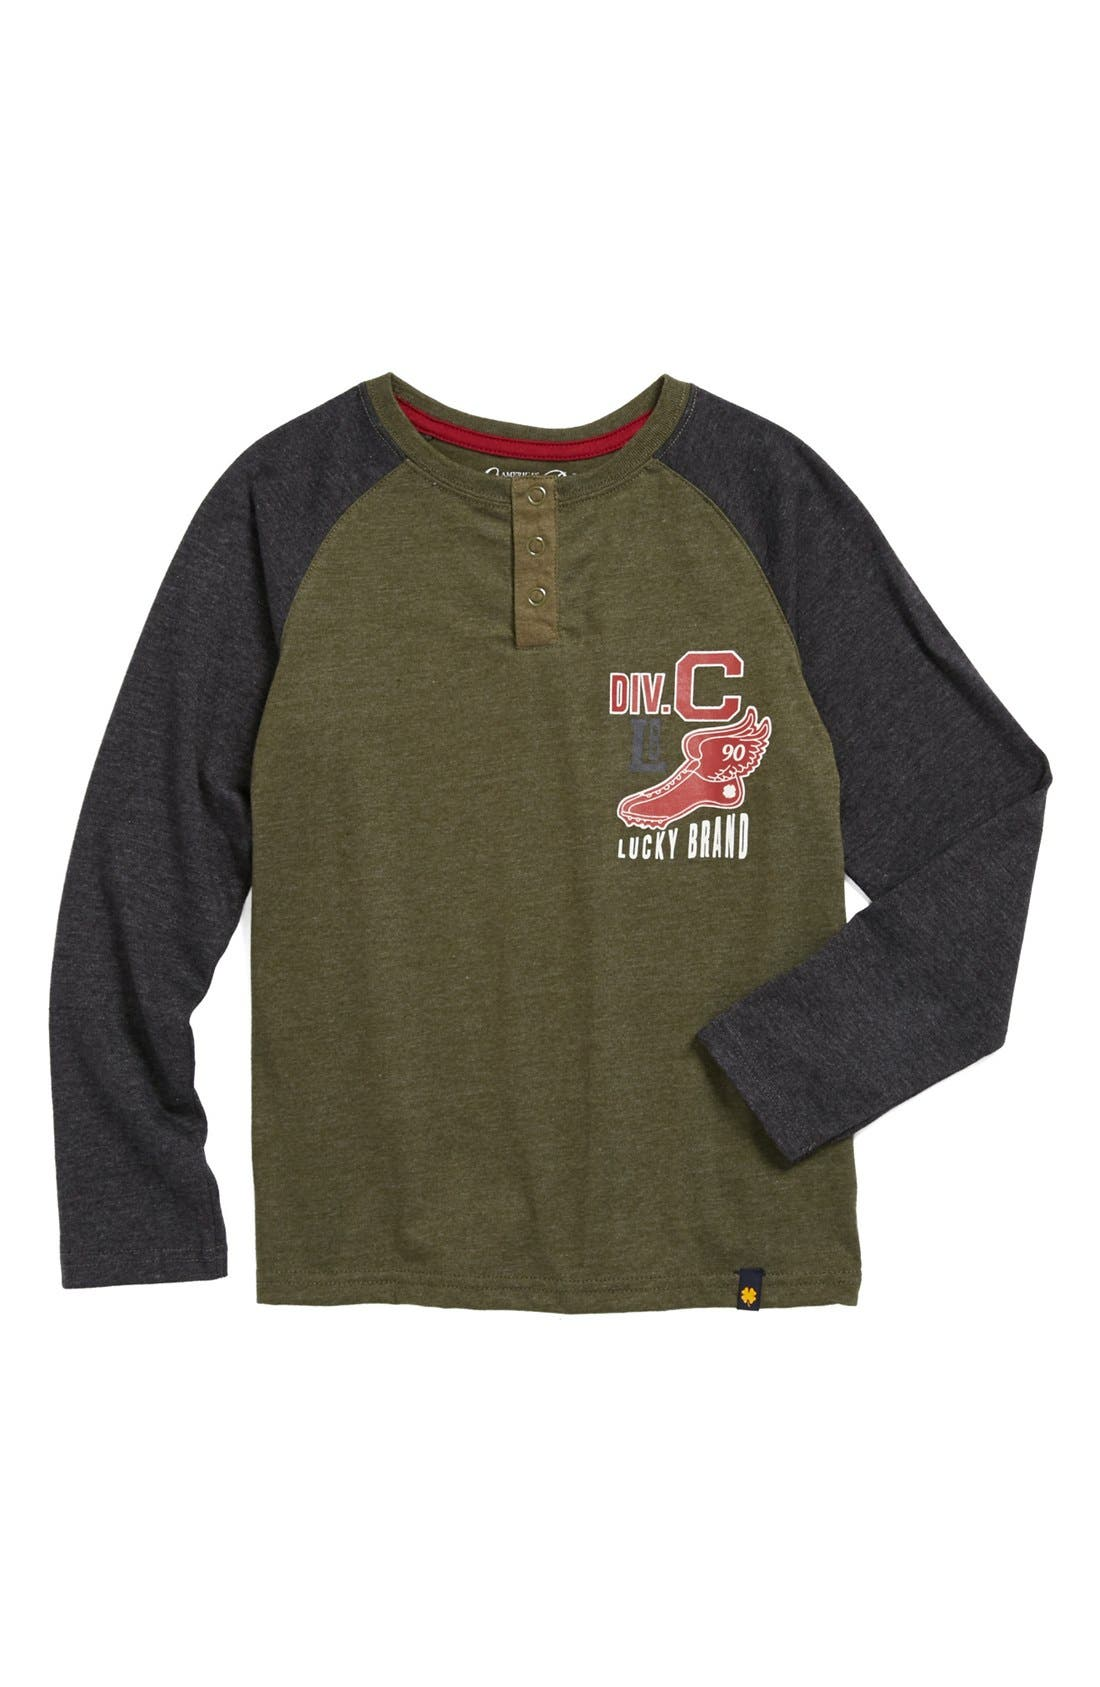 Alternate Image 1 Selected - Lucky Brand 'Division' Henley (Little Boys)